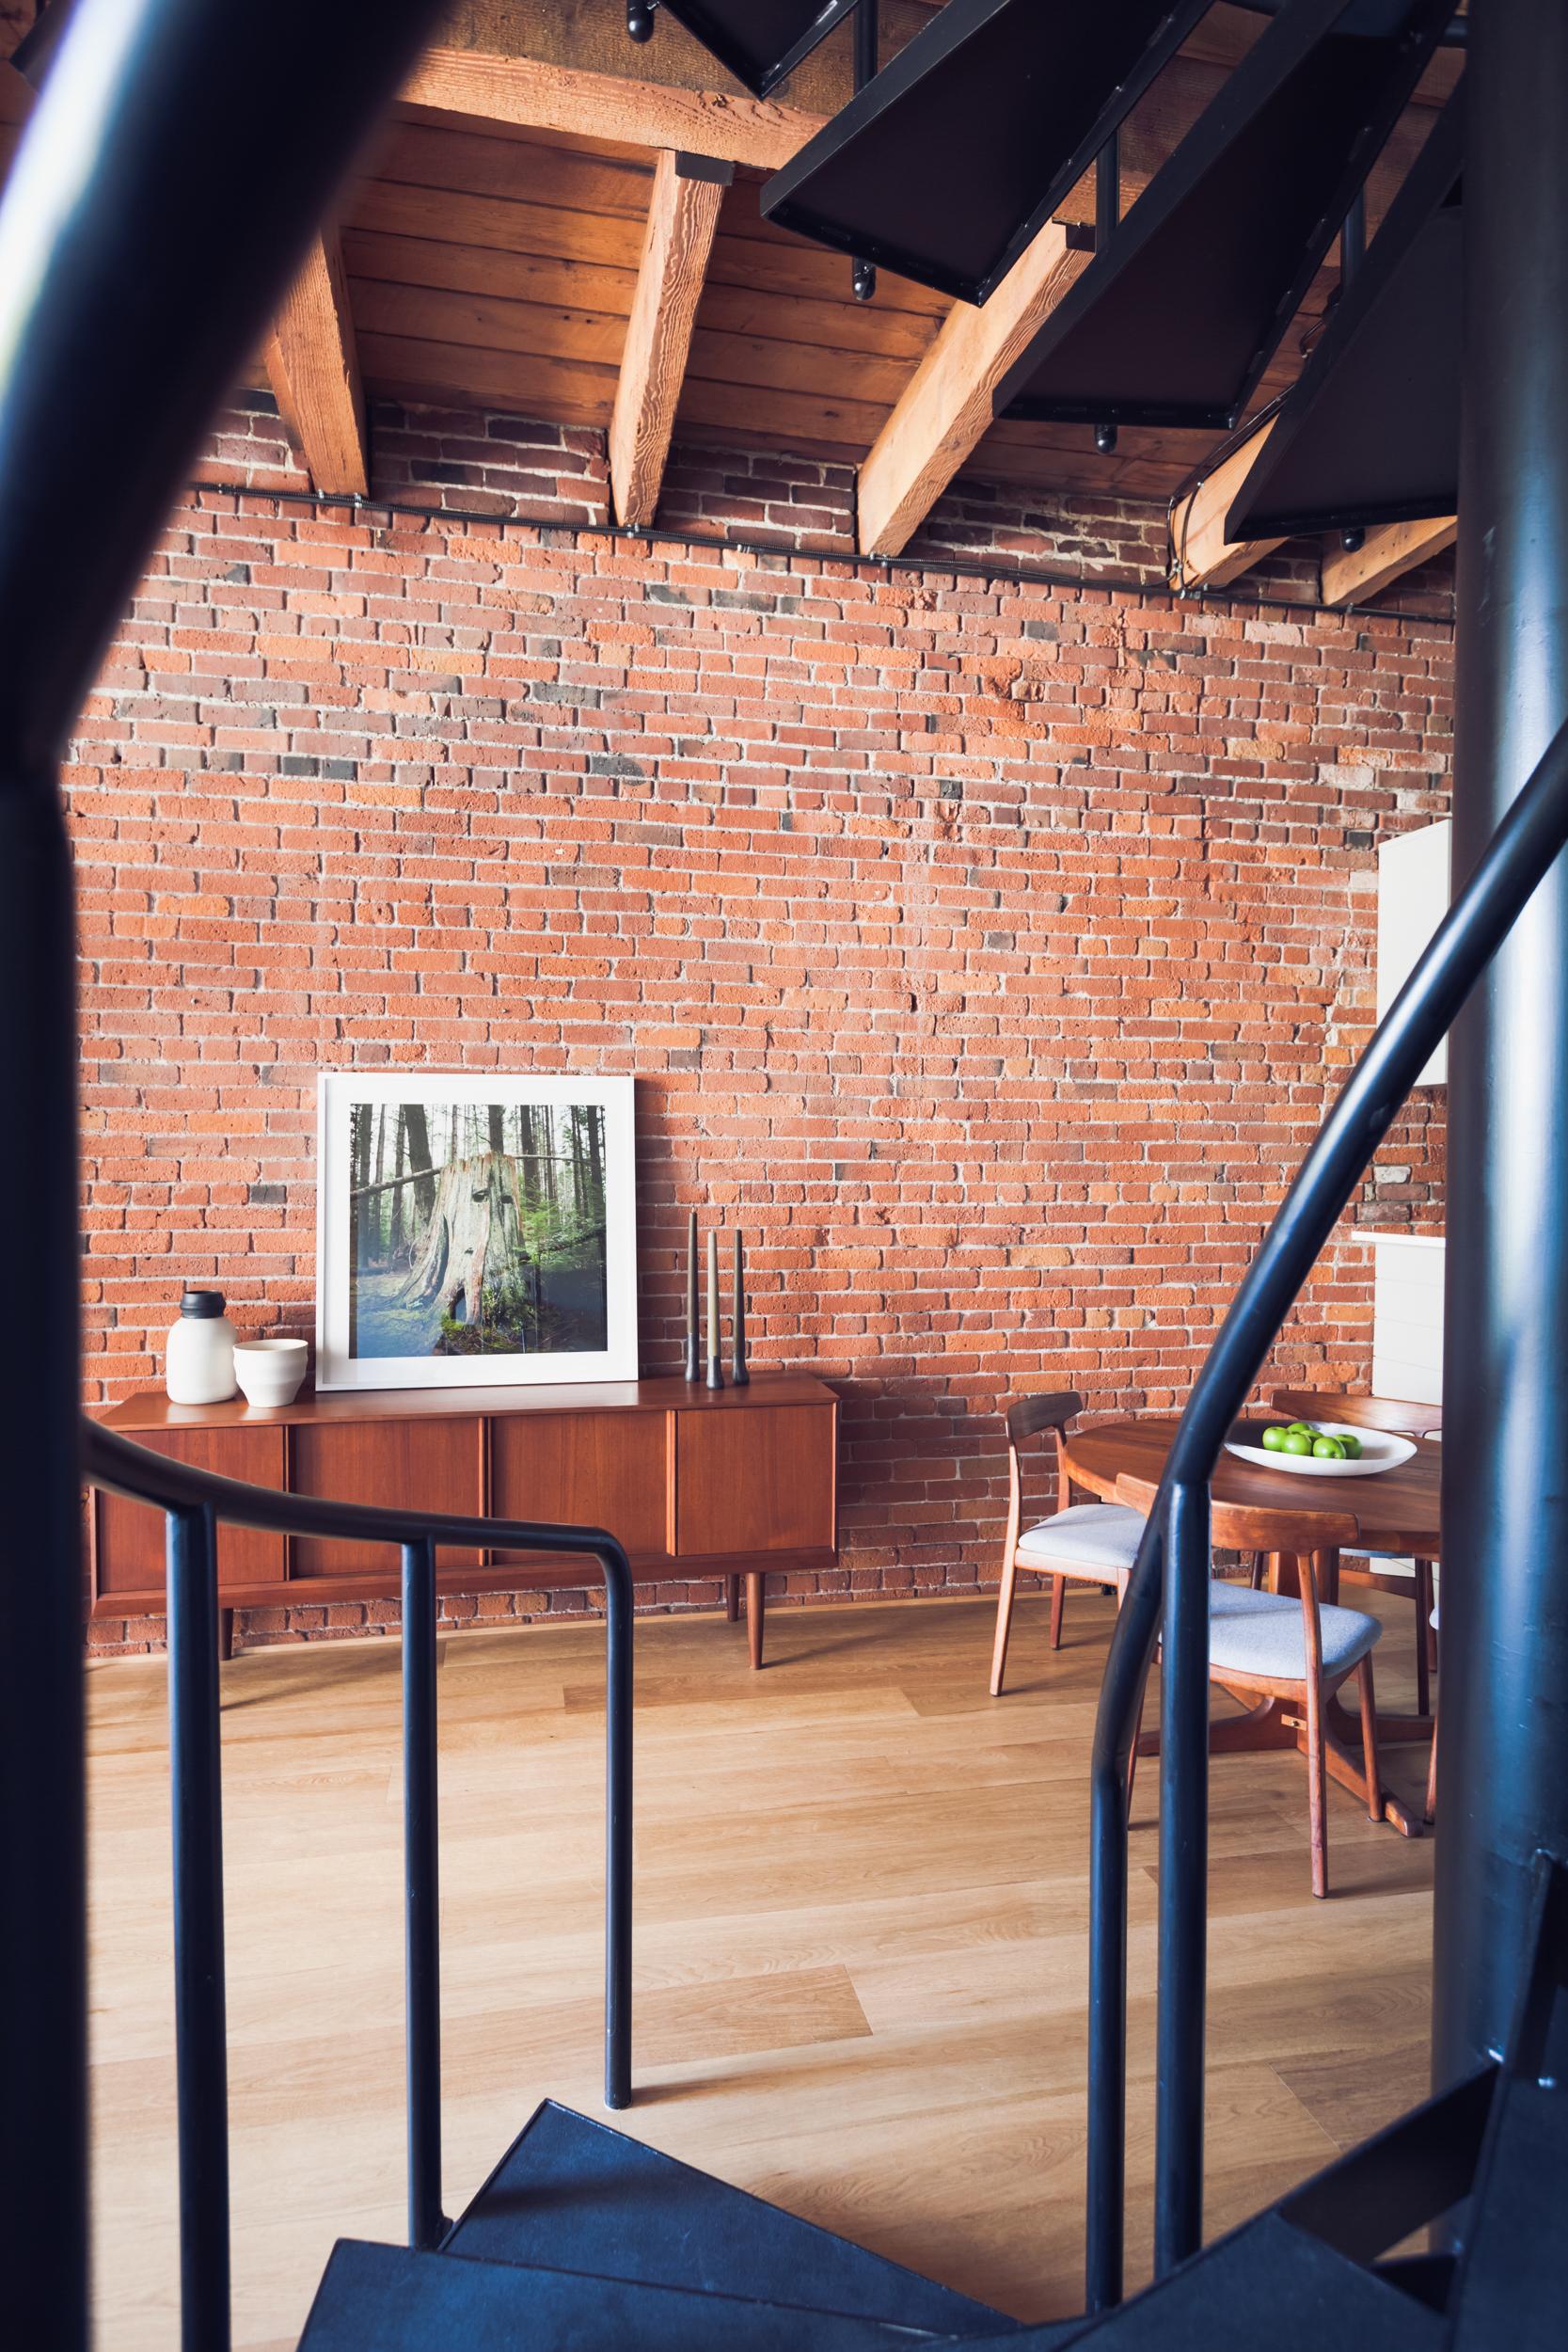 vancouver-interior-design-0006.jpg